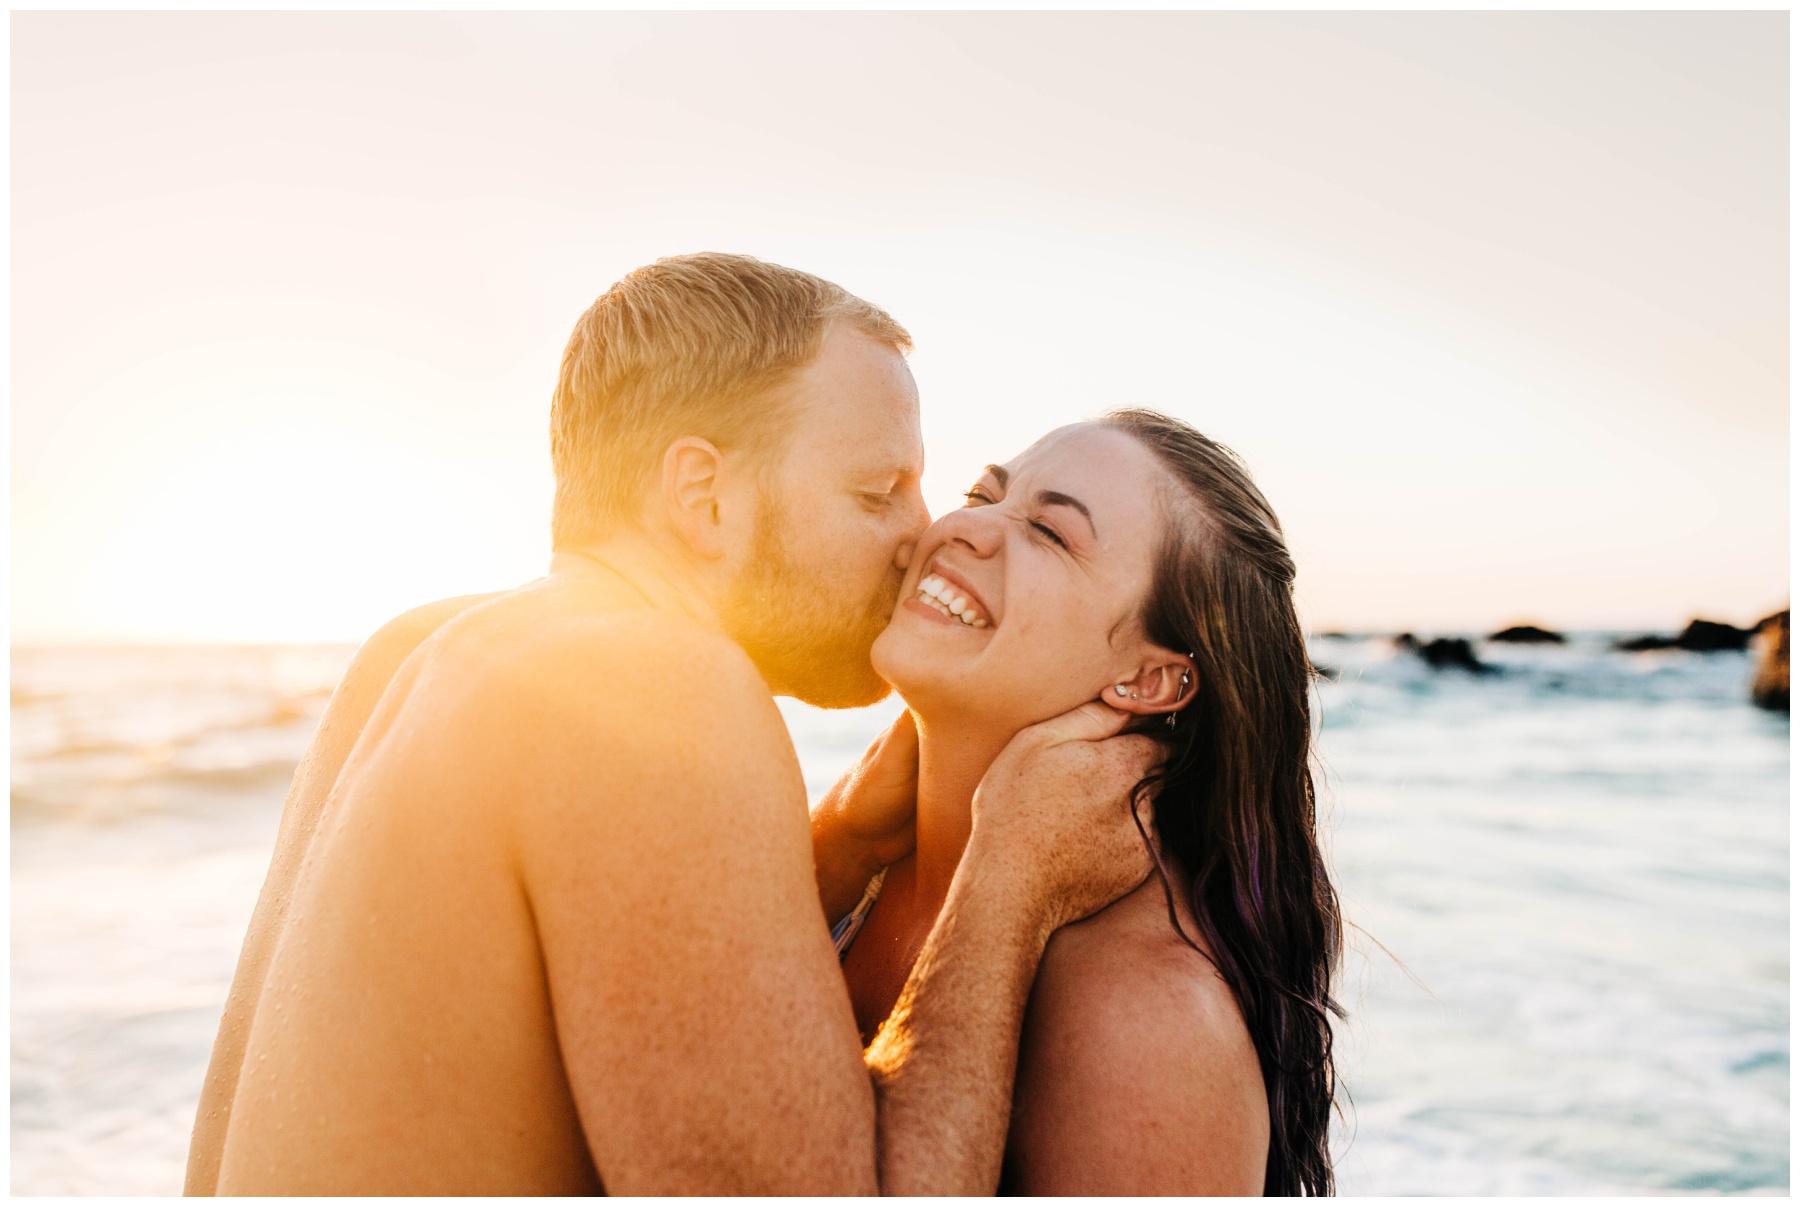 kua-bay-hawaii-engagement-photo-session